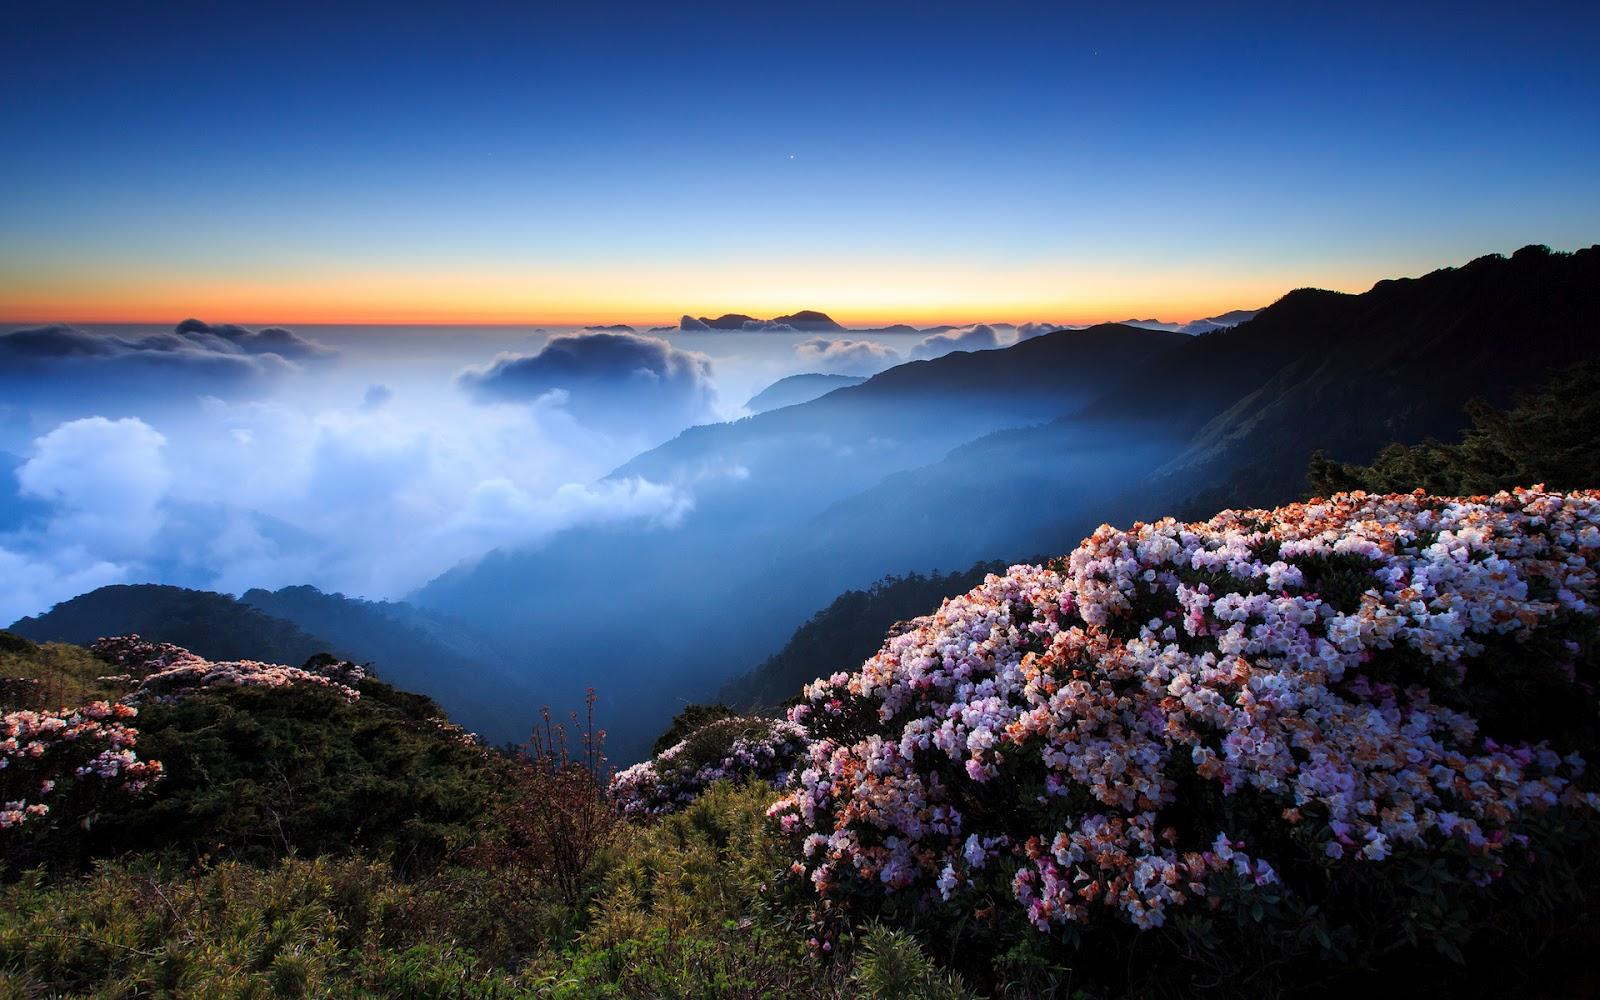 Hermosos paisajes naturales en hd parte iii fotos e for Full hd house image